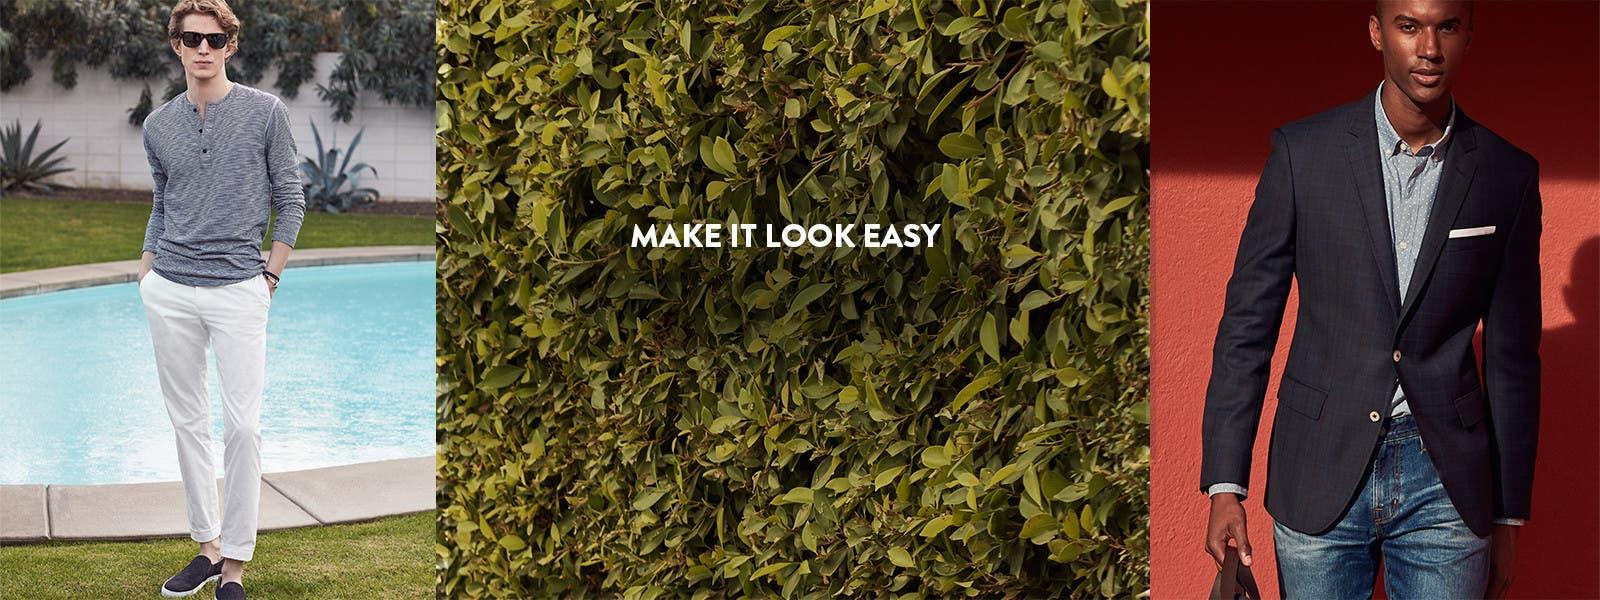 Make it look easy.